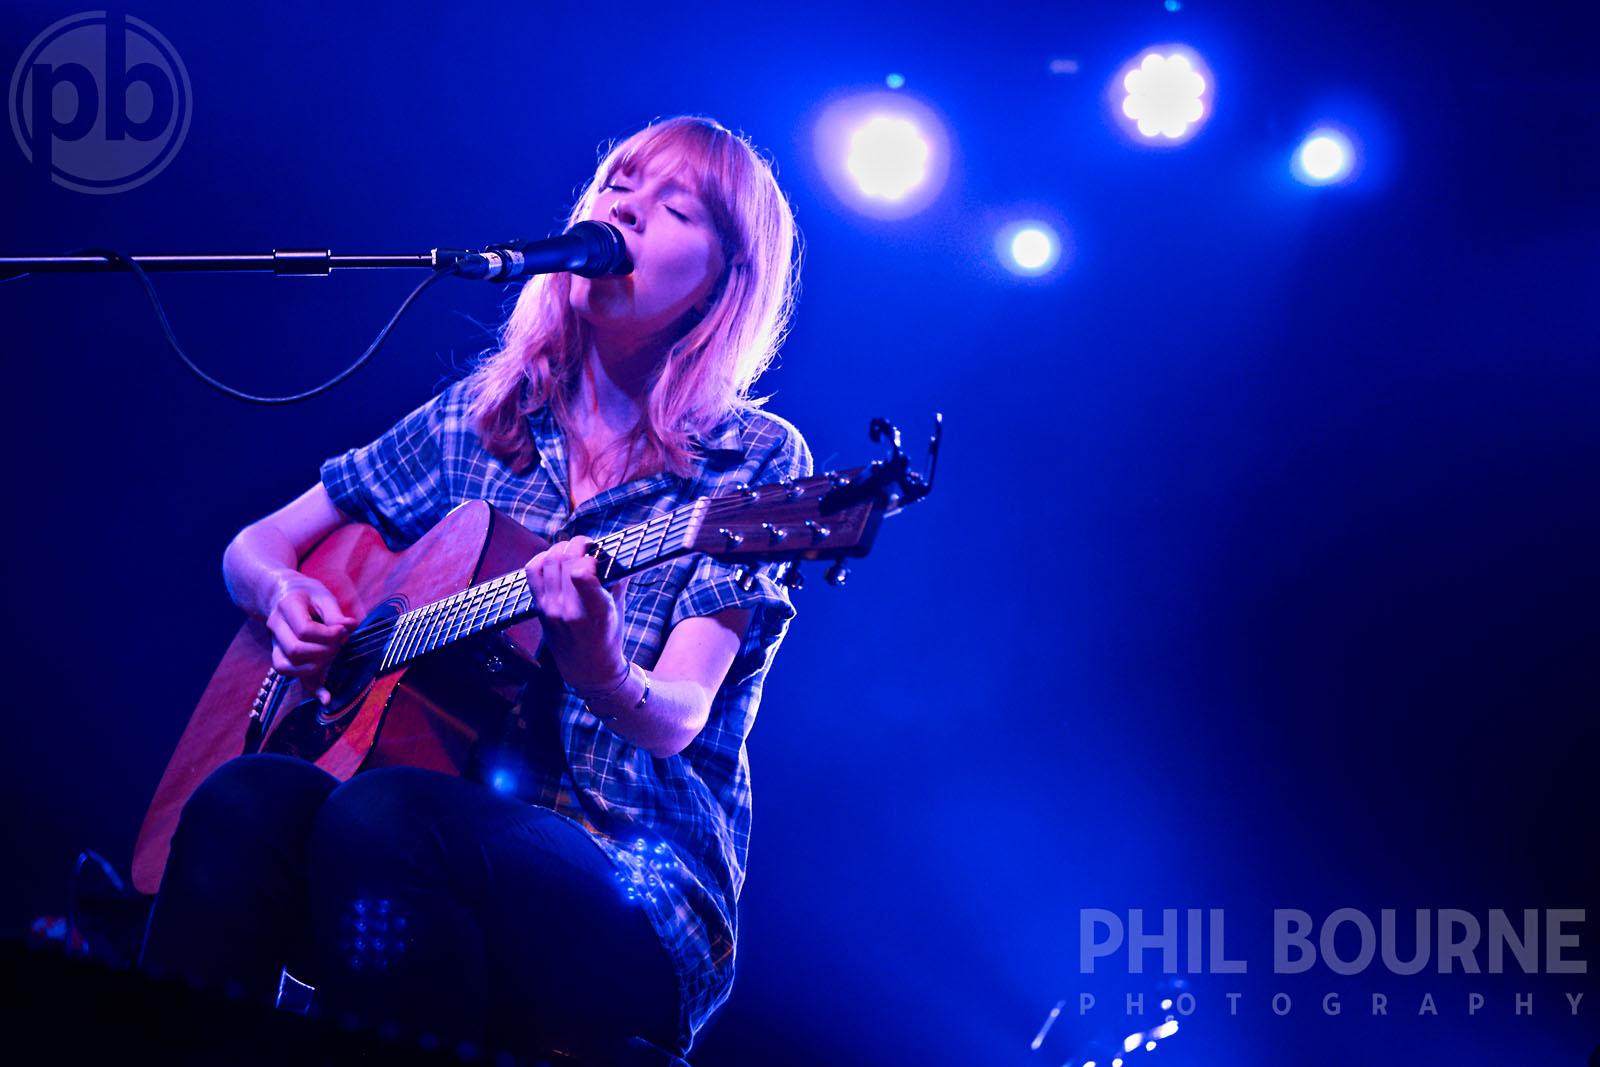 015_Live_Music_Photographer_London_Lucy_Rose_001.jpg